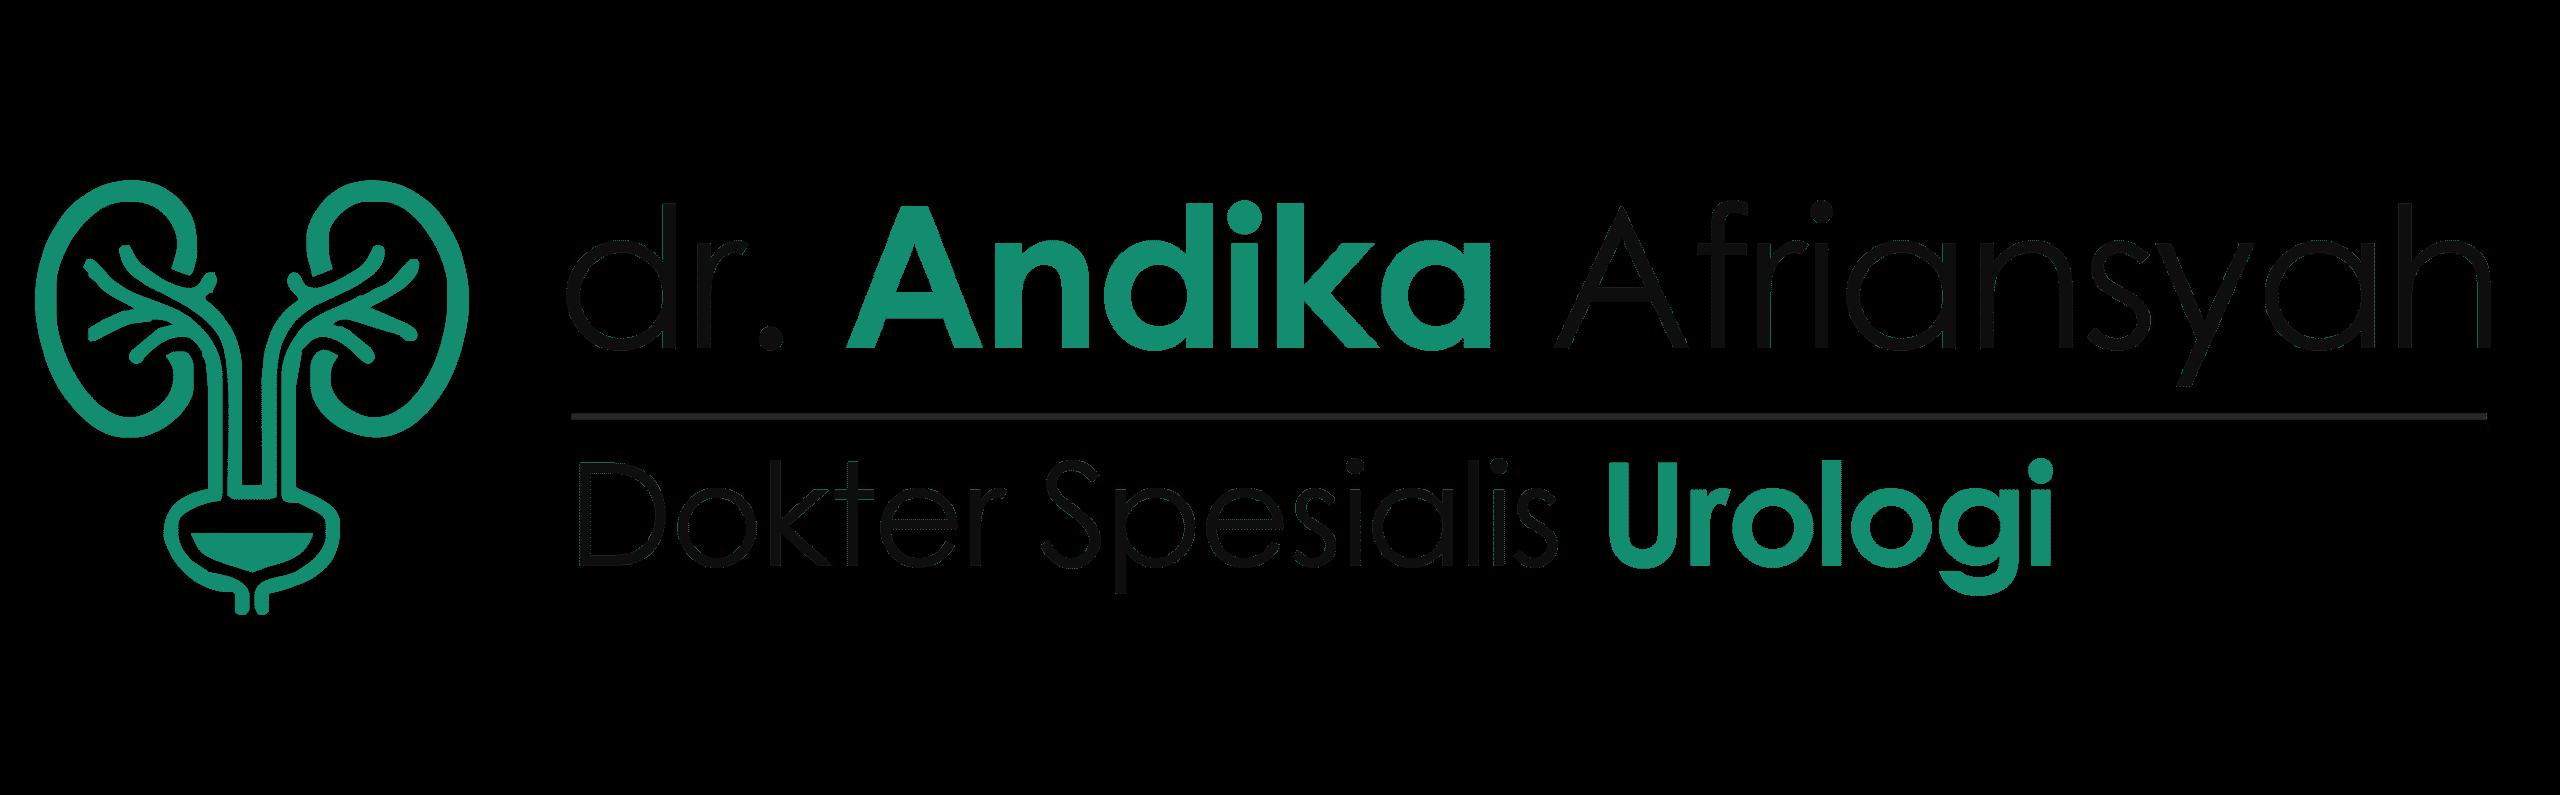 dr. Andika Afriansyah